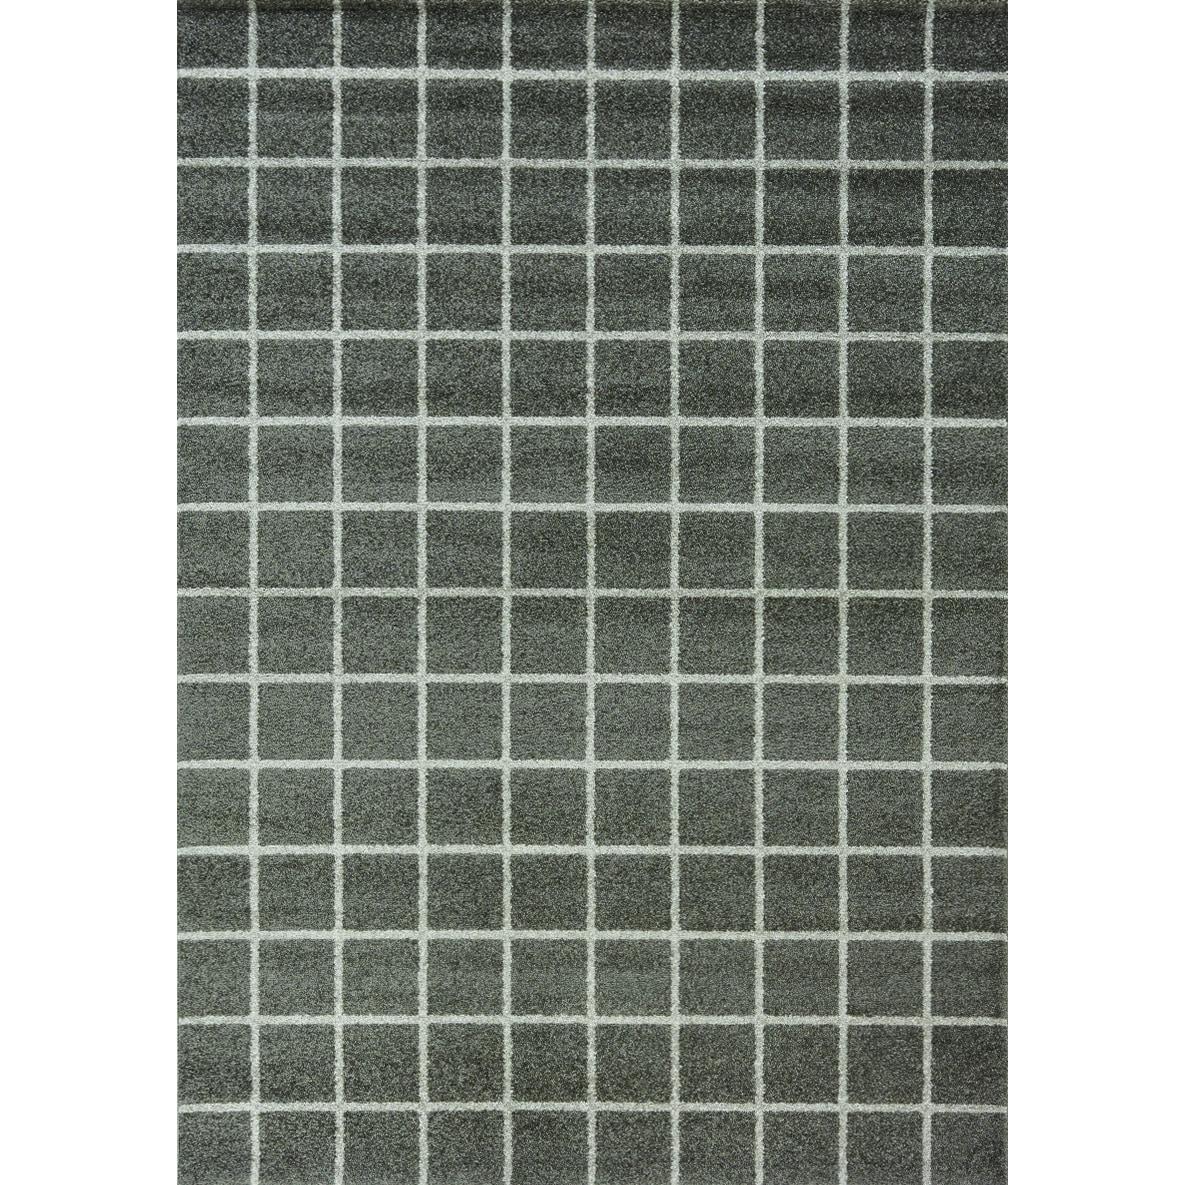 Kalora Interiors Camilla Charcoal/ Cream Tile Rug - 5'3 x 7'7